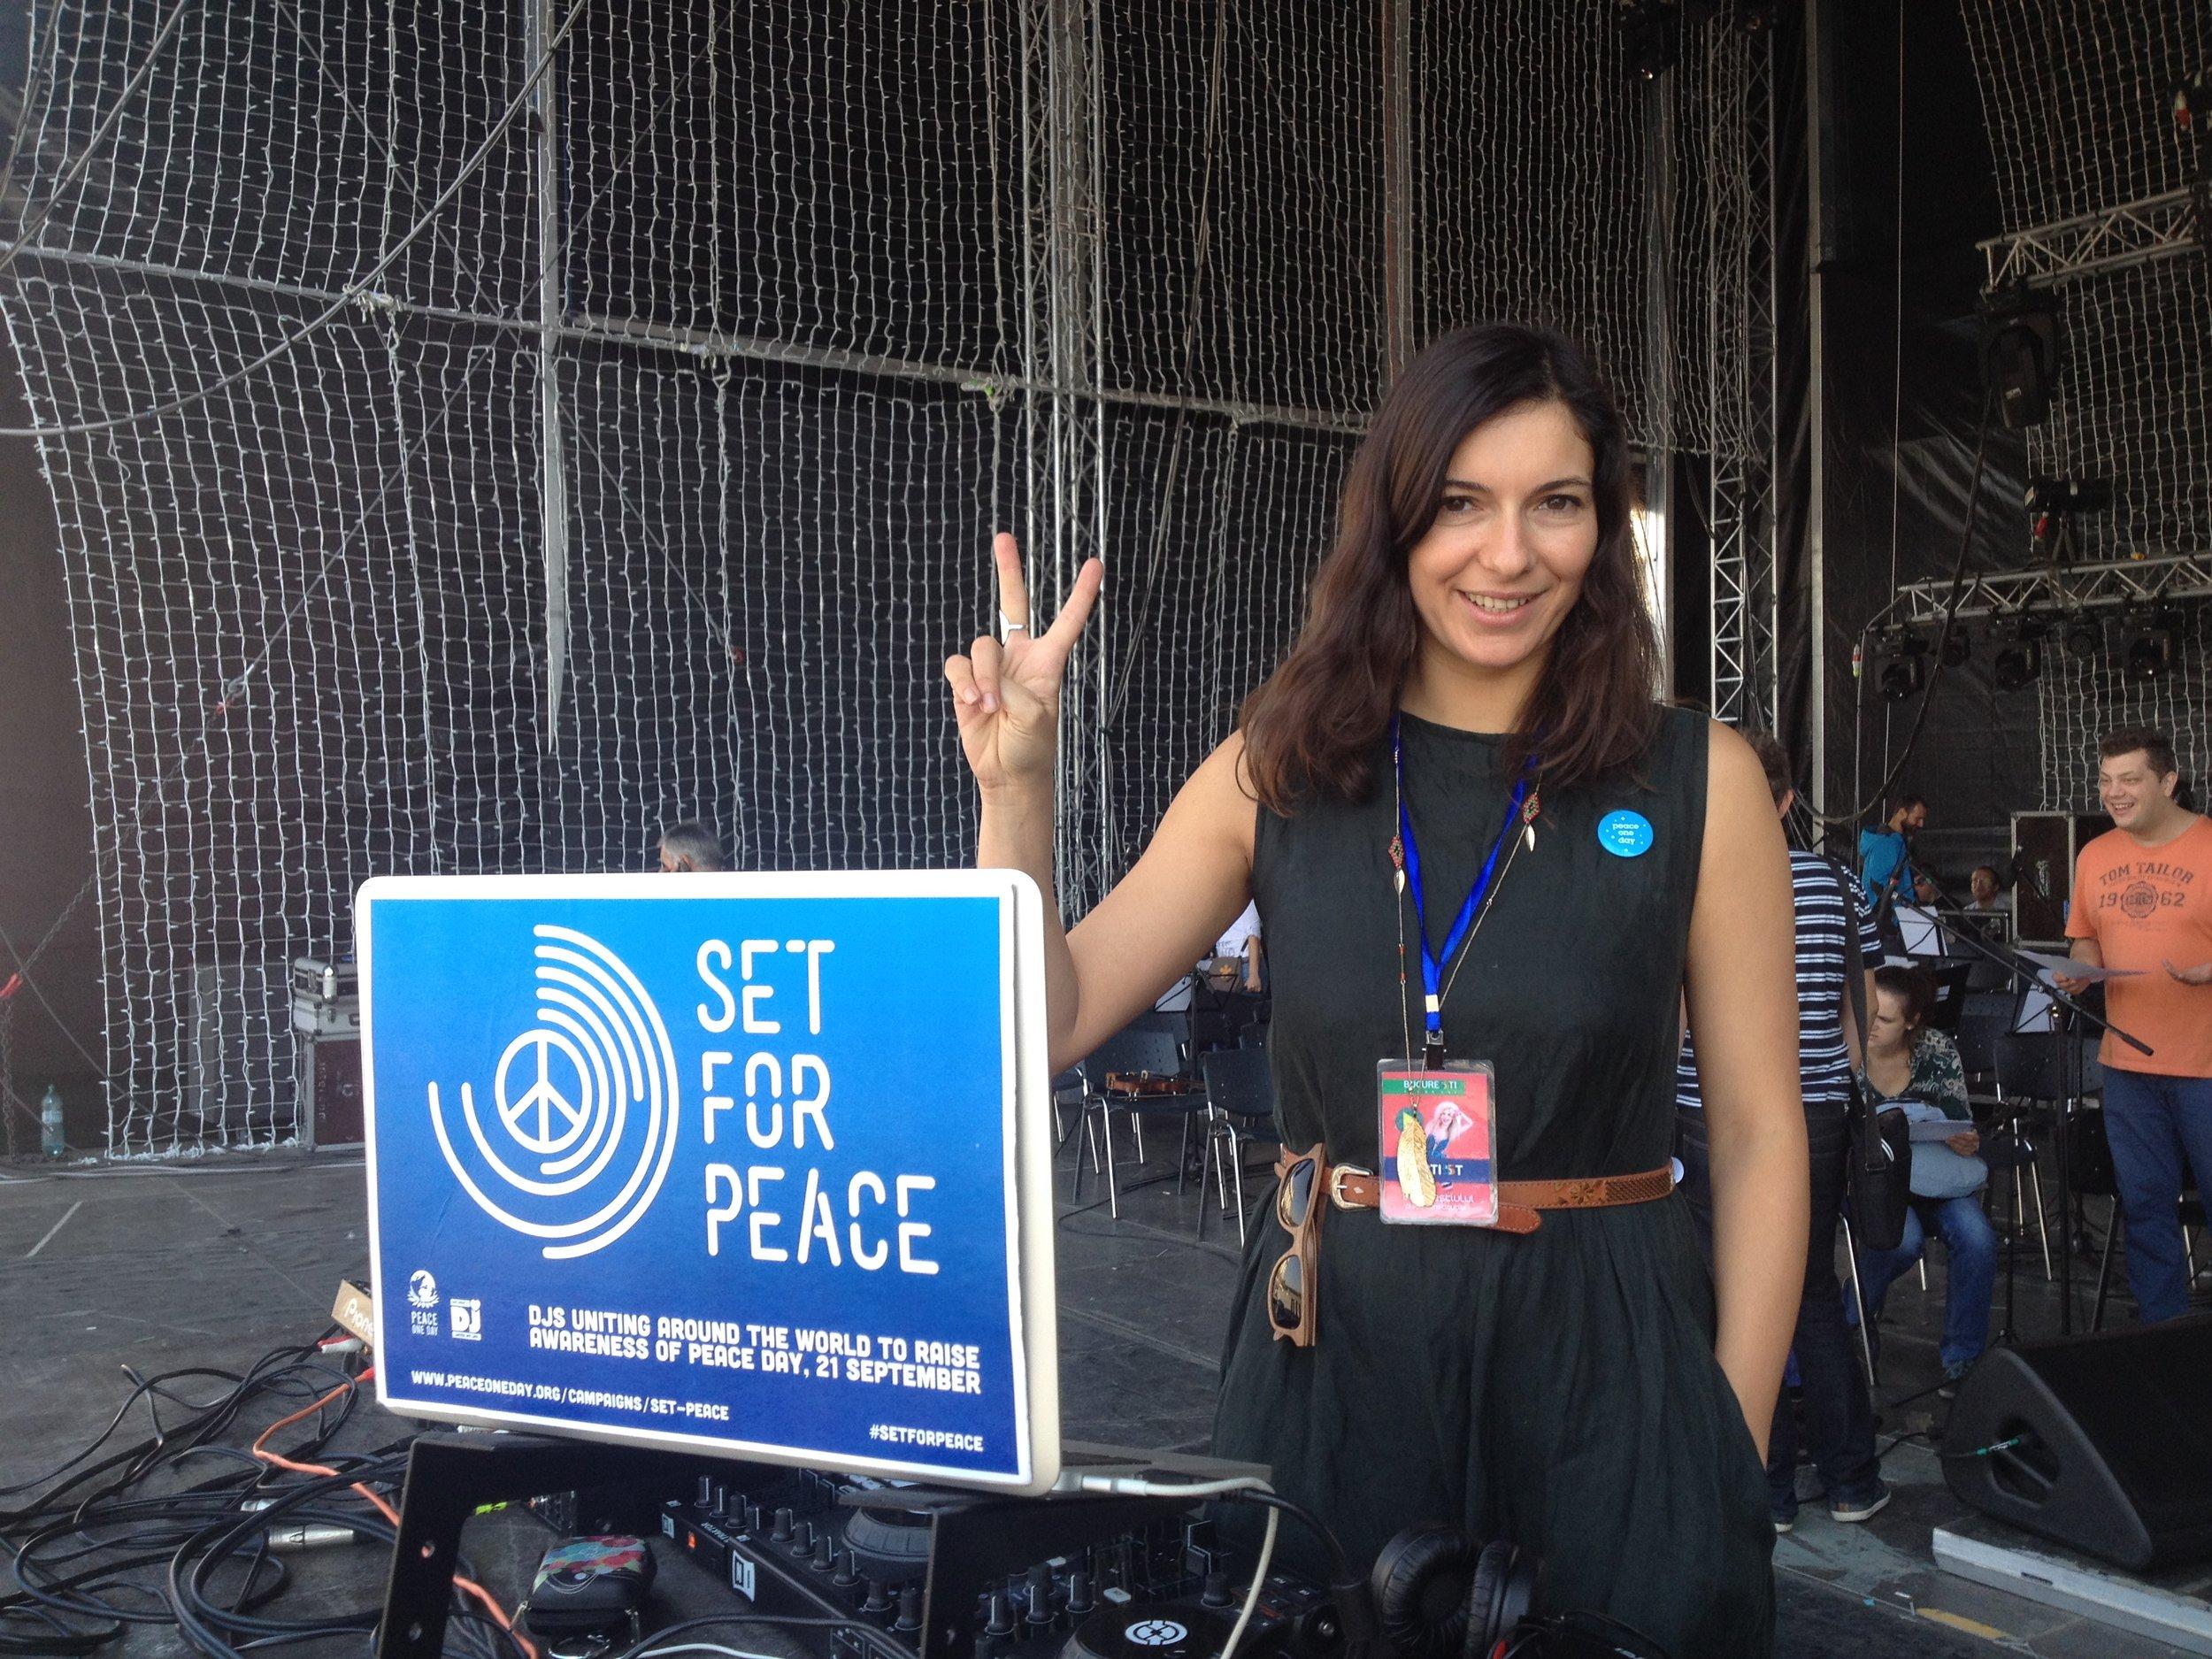 Set for Peace gig